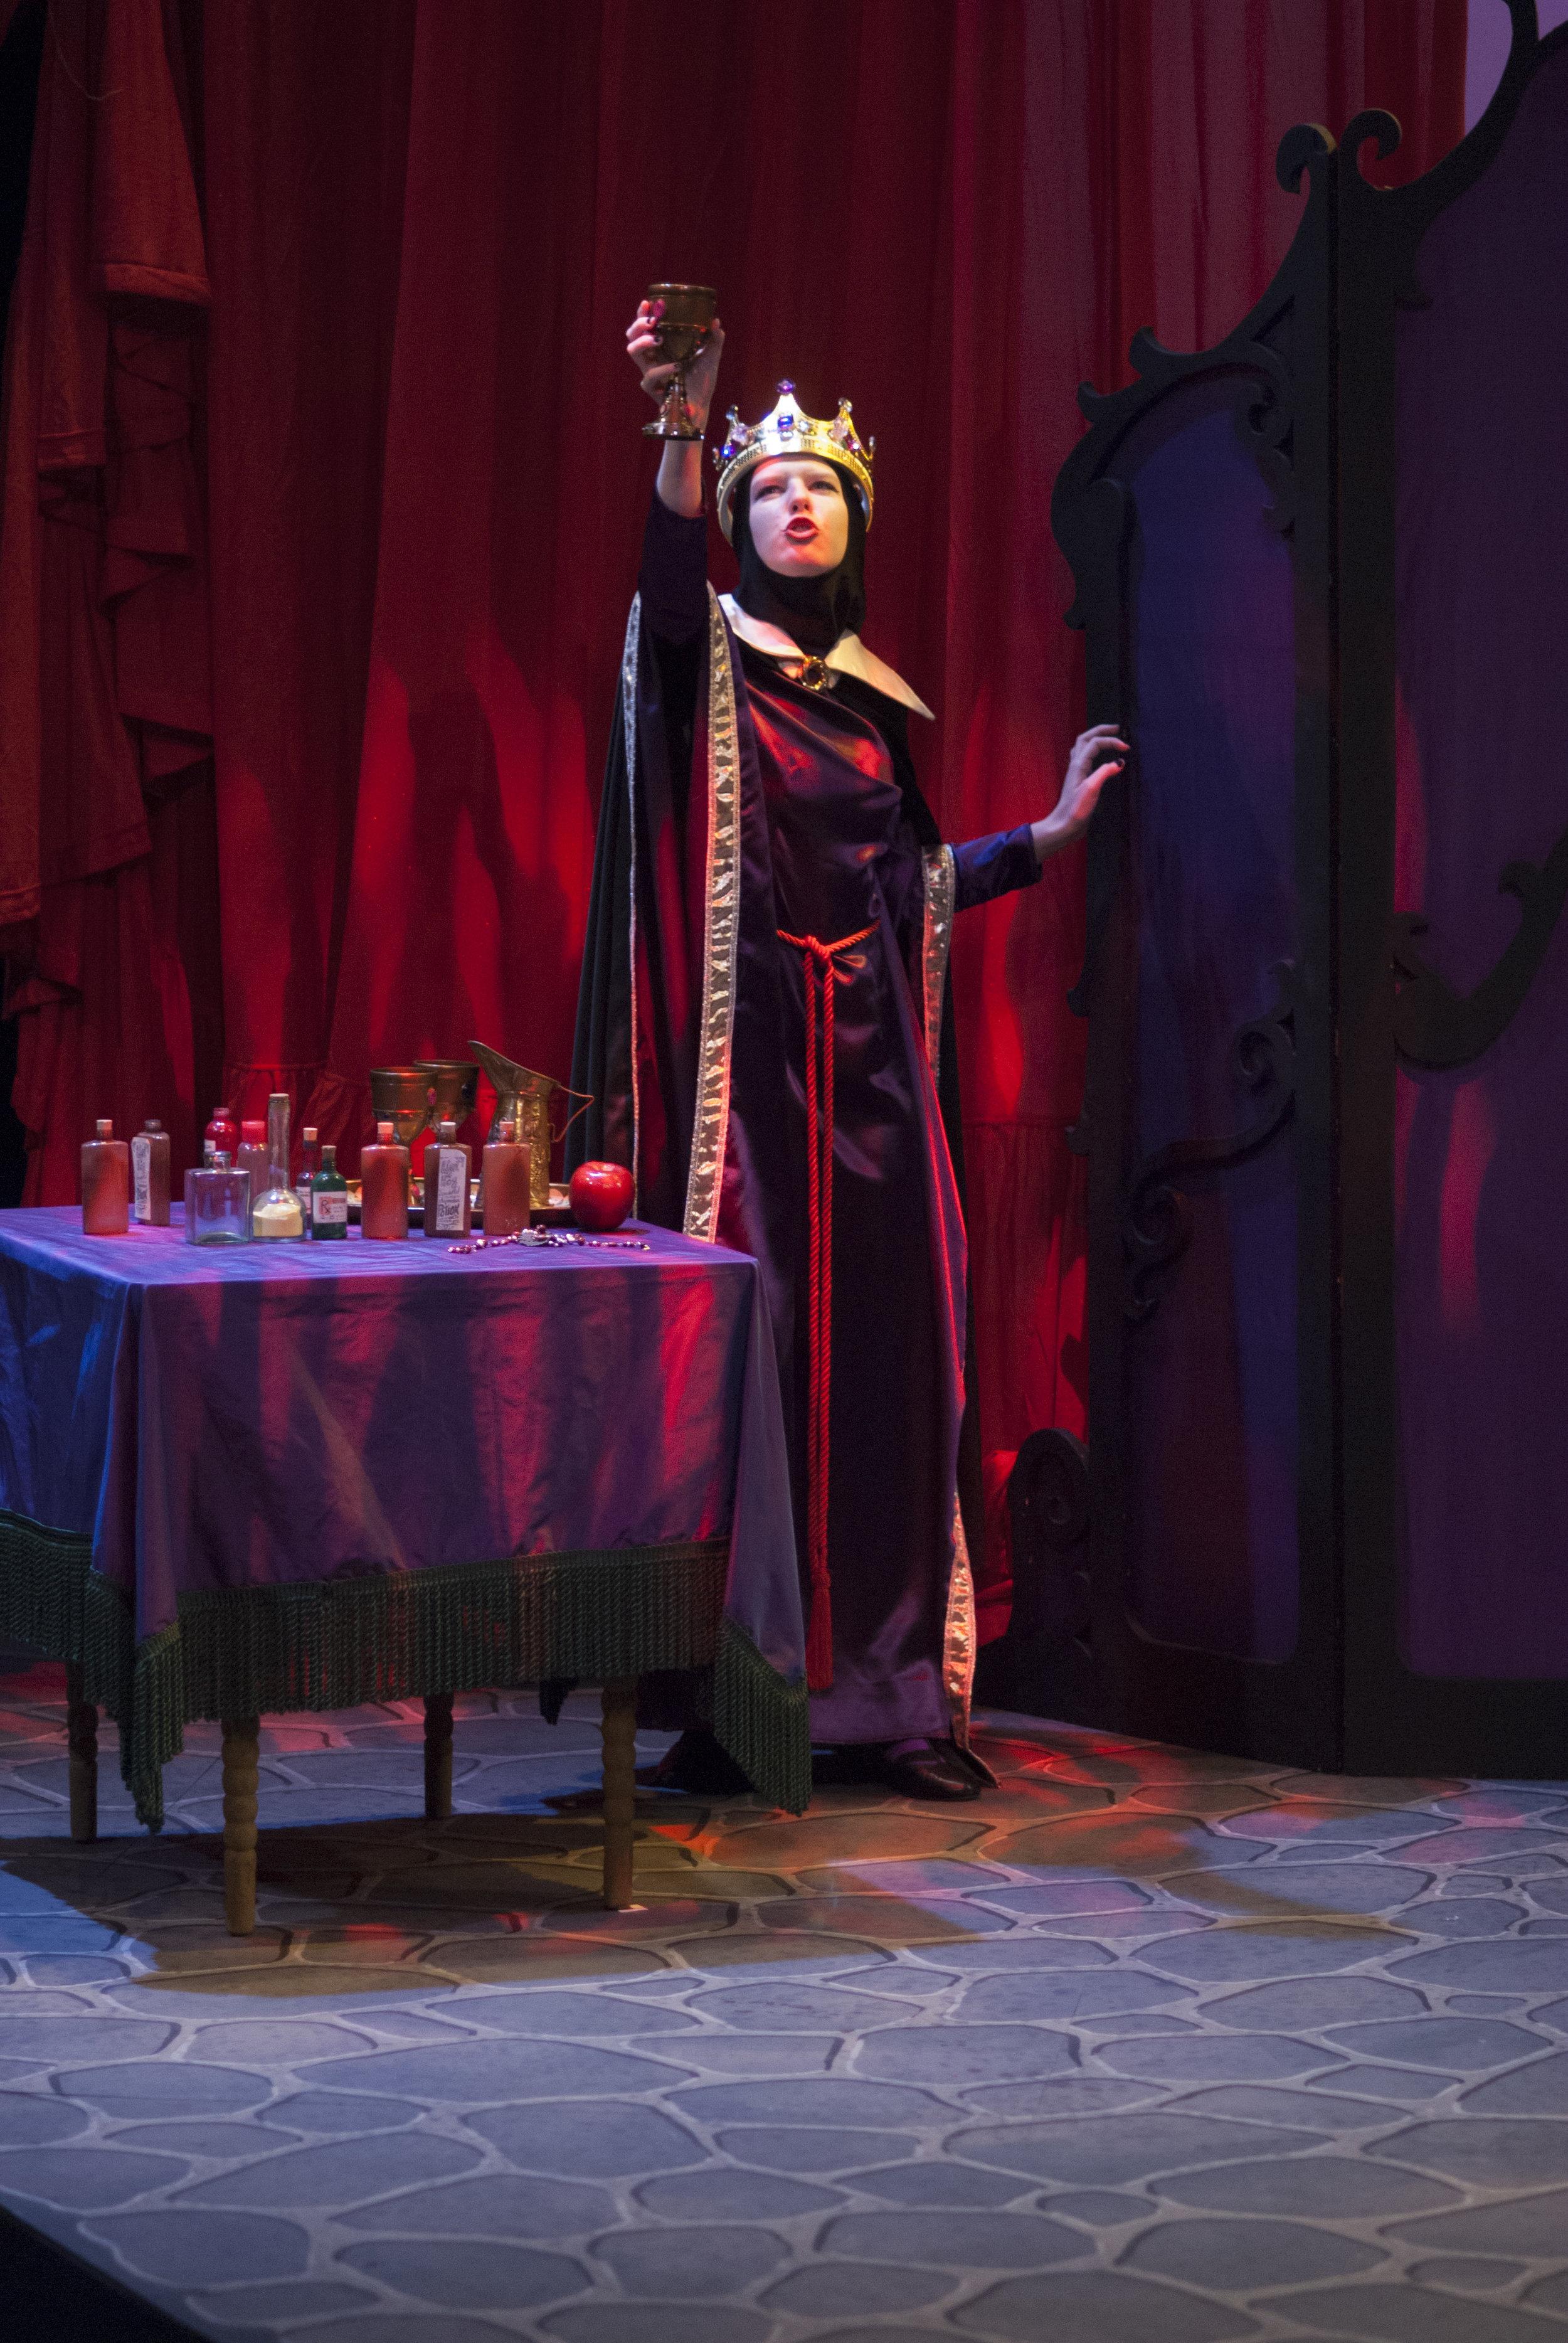 045-Snow White Performance-Hirez.jpg